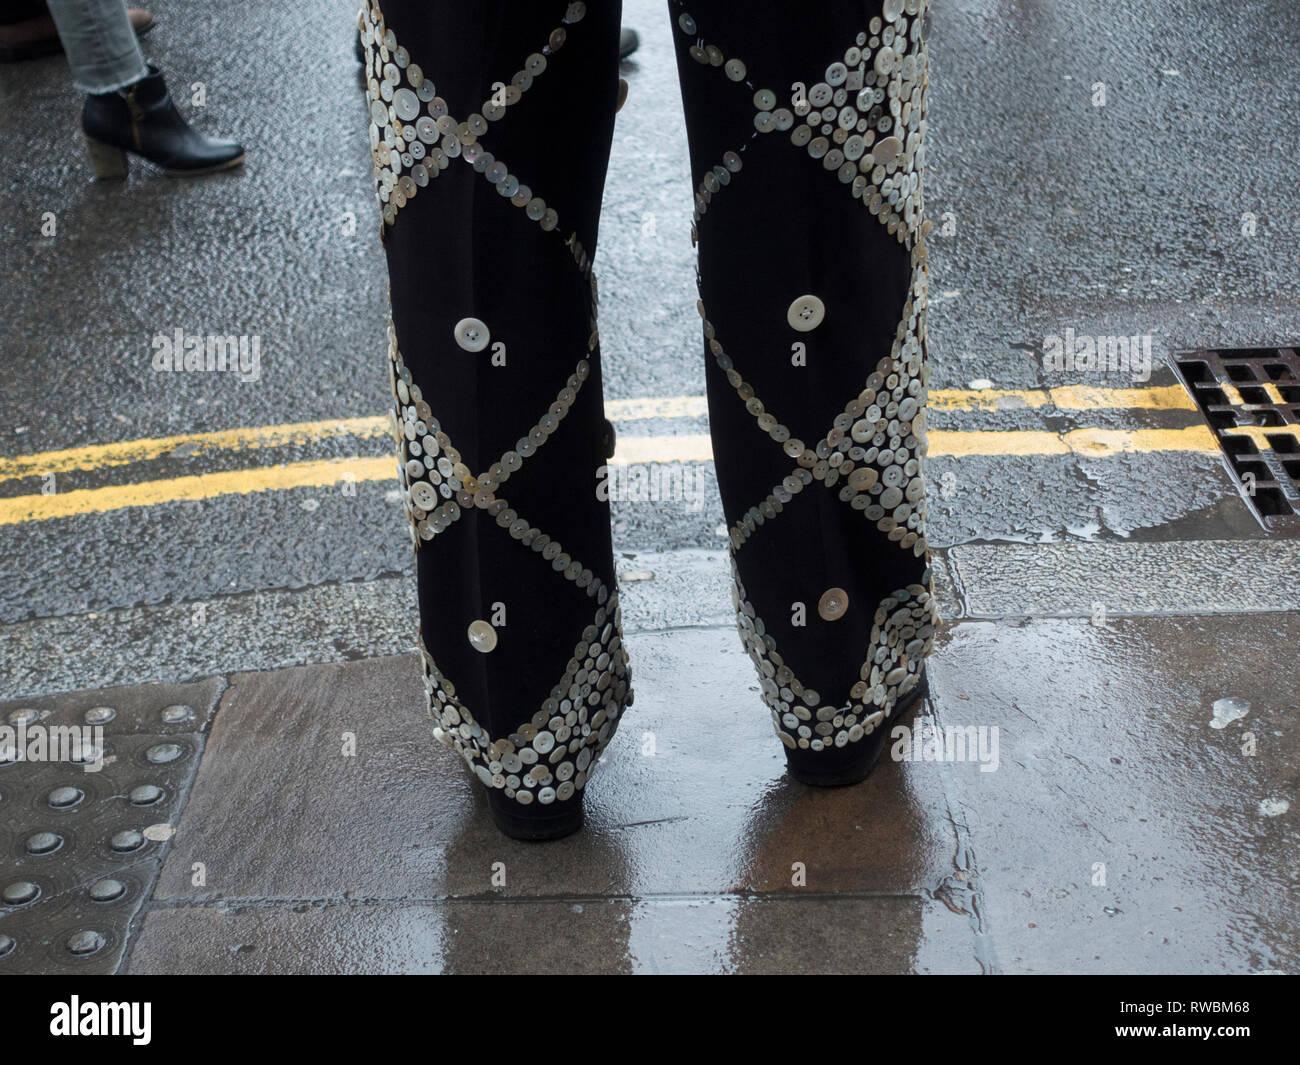 Pearly King standing on Brick Lane - Stock Image